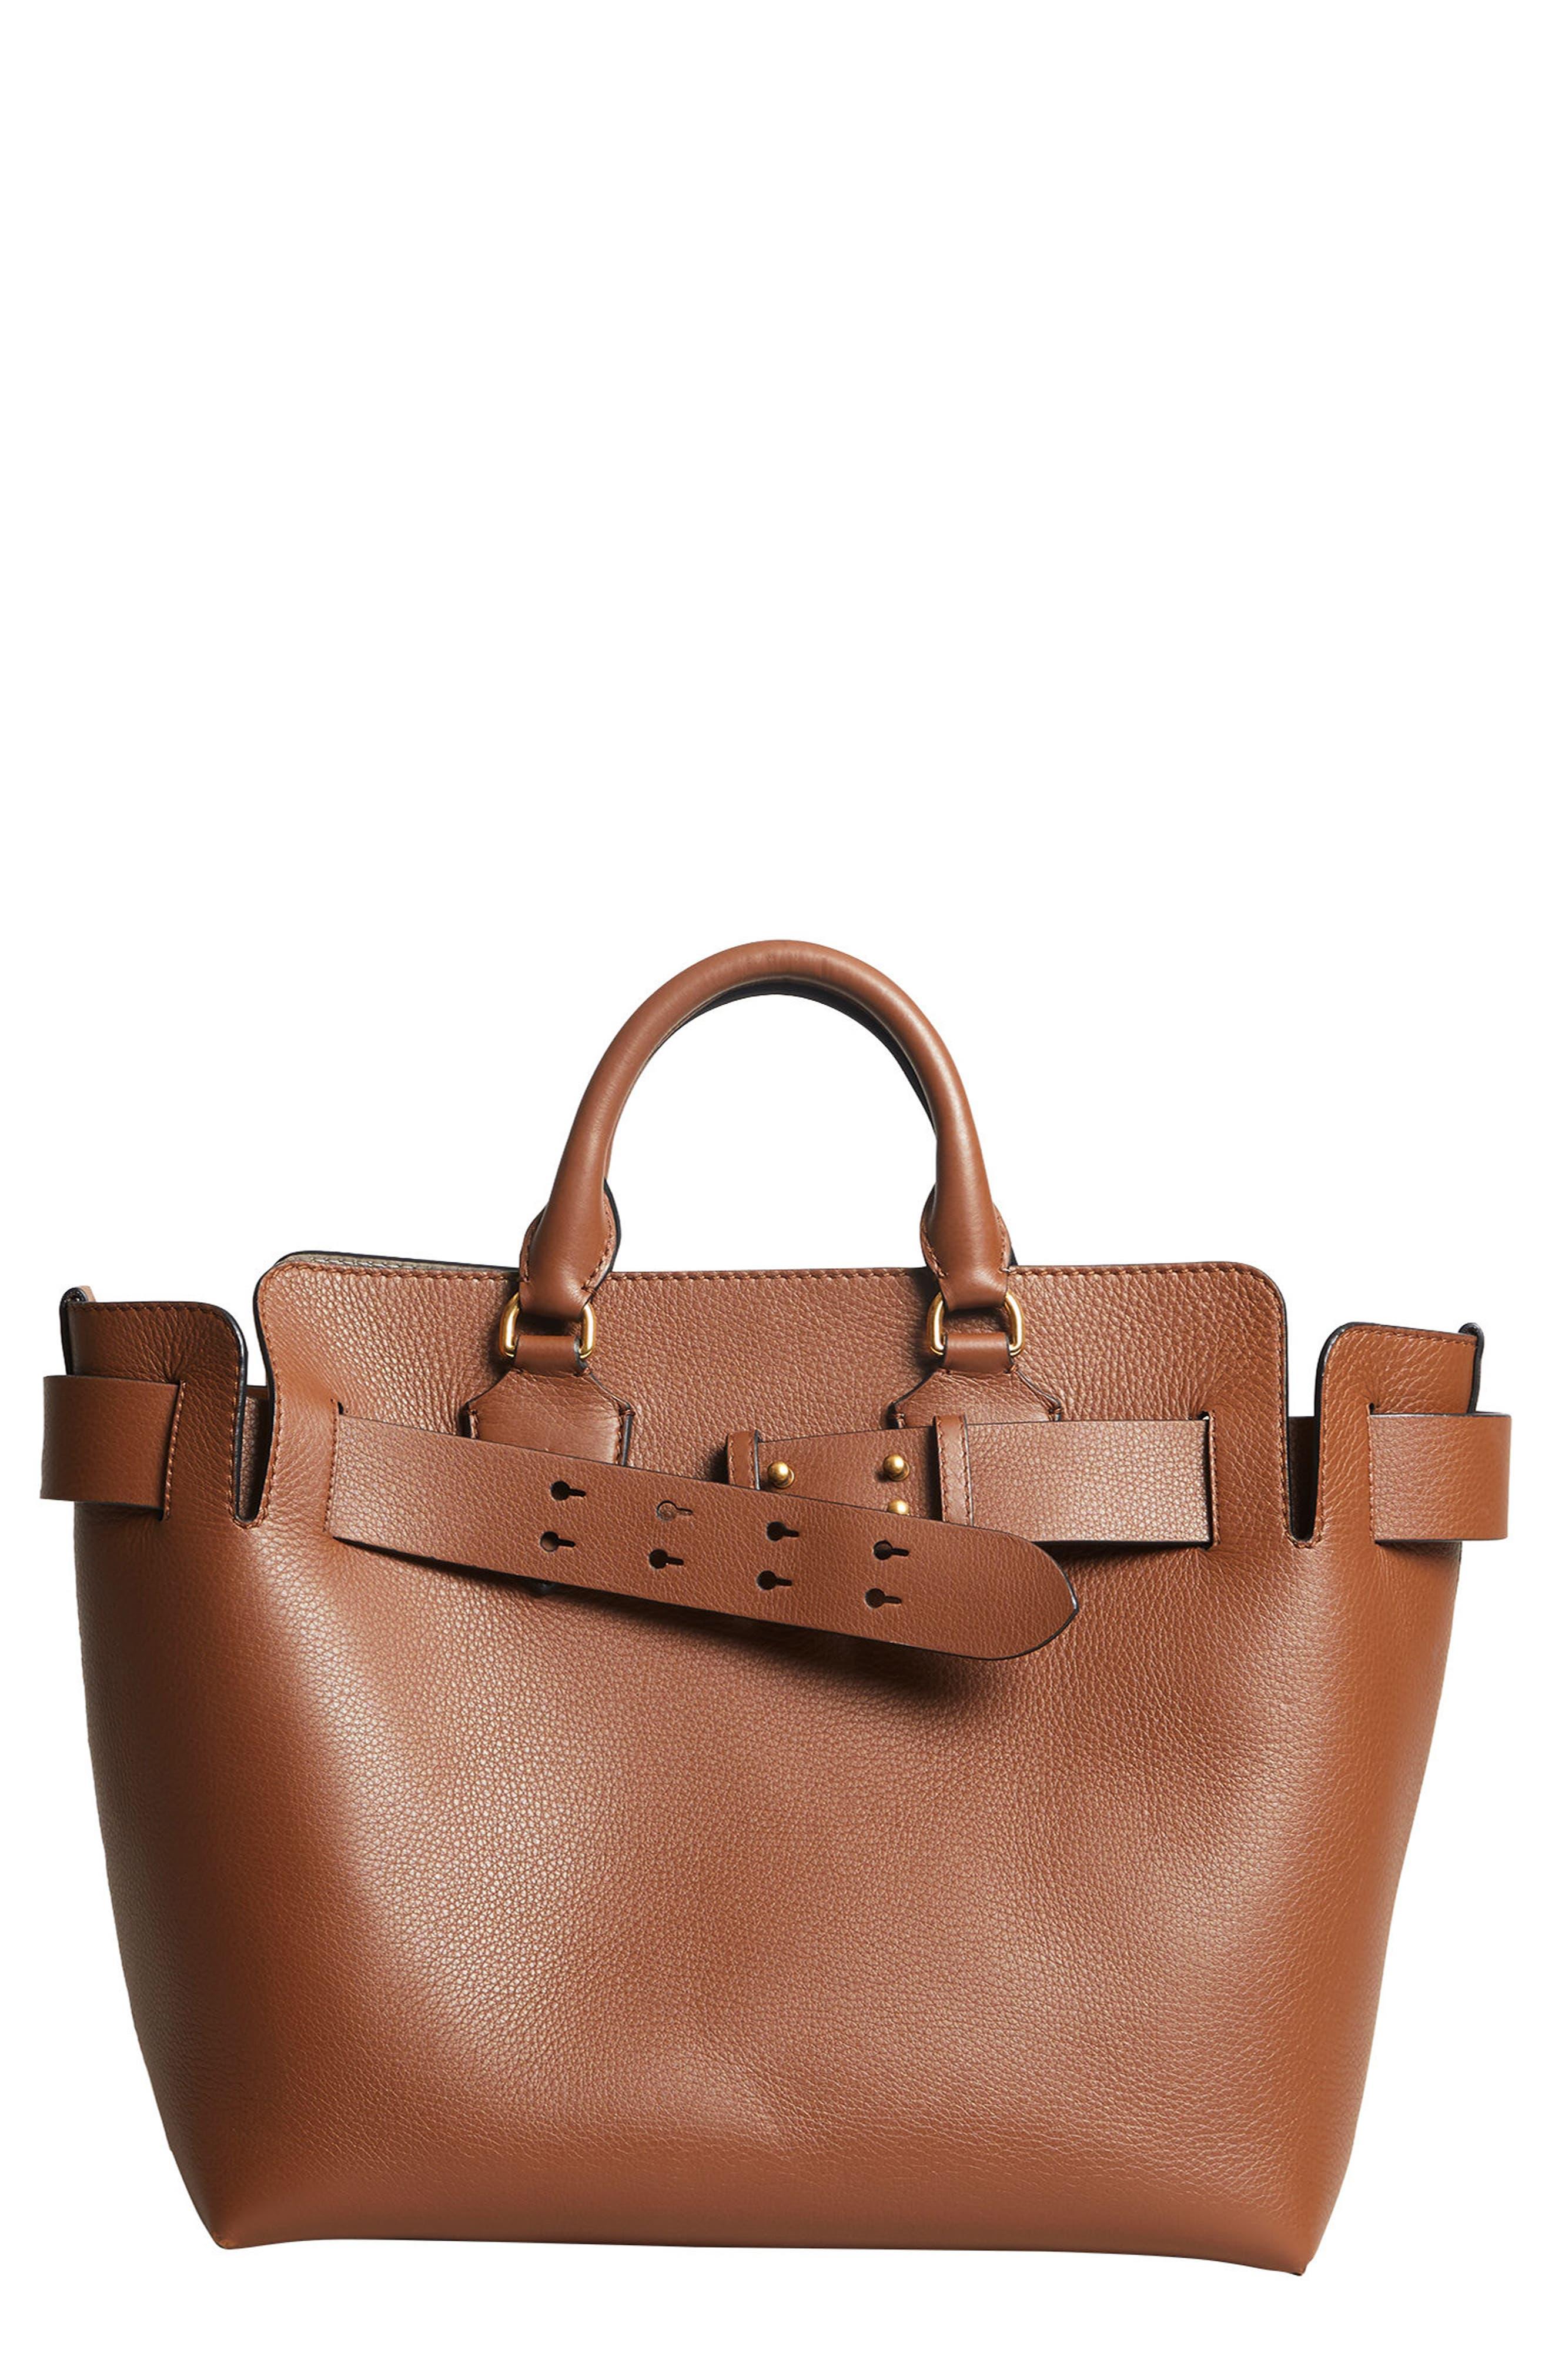 Medium Belt Bag Leather Tote,                         Main,                         color, 216